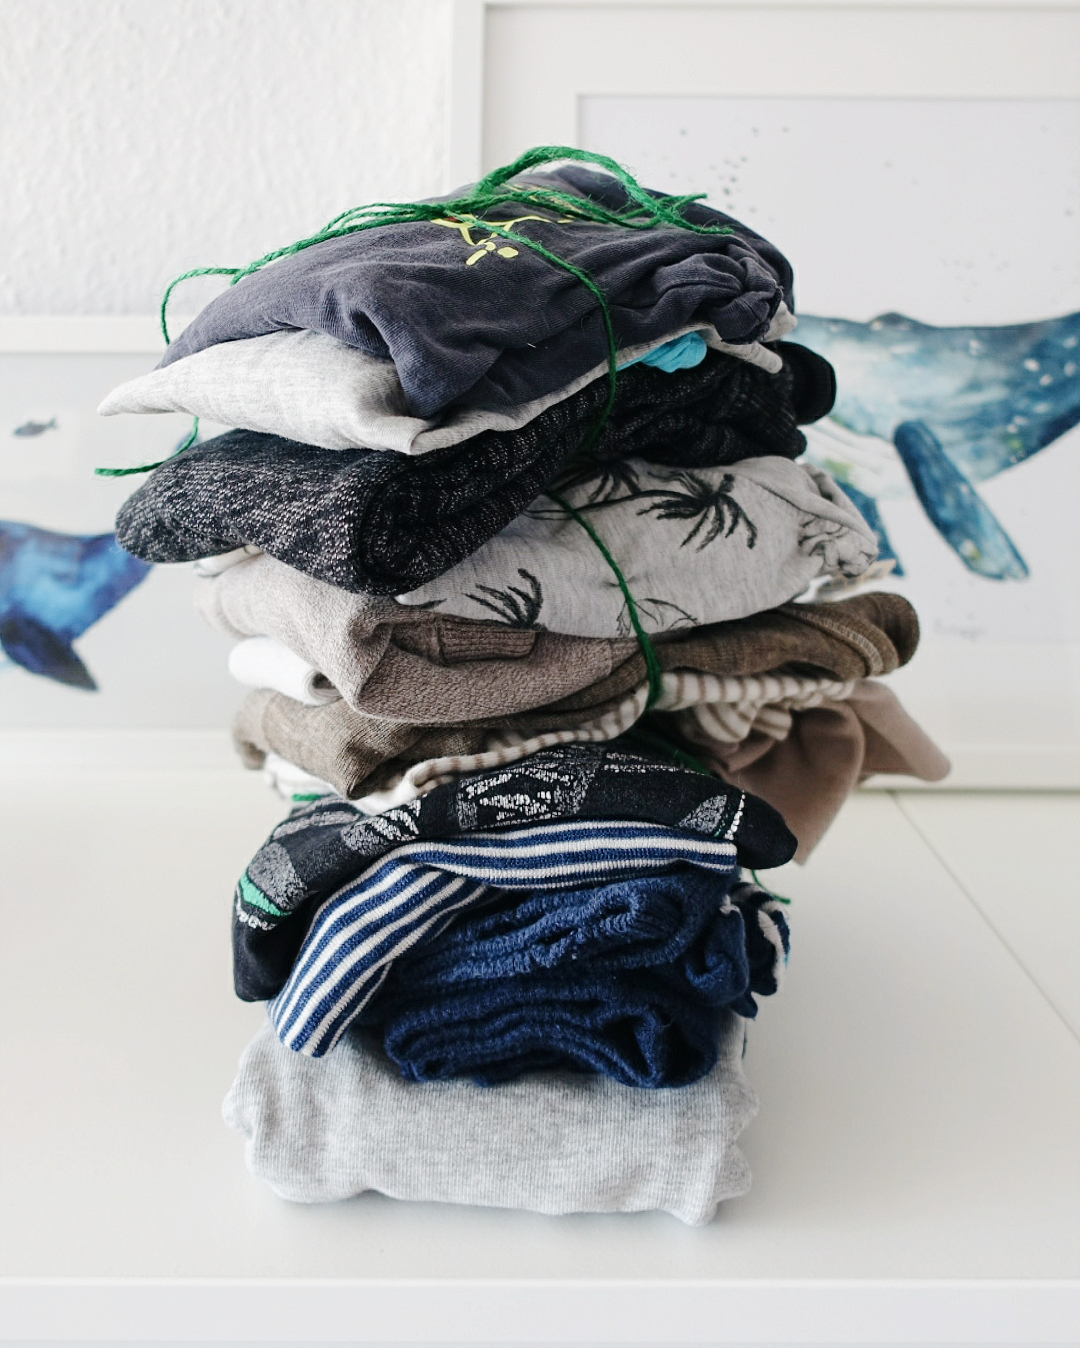 Kinder einfach anziehen lassen | #momhack #lifehack | judetta.de